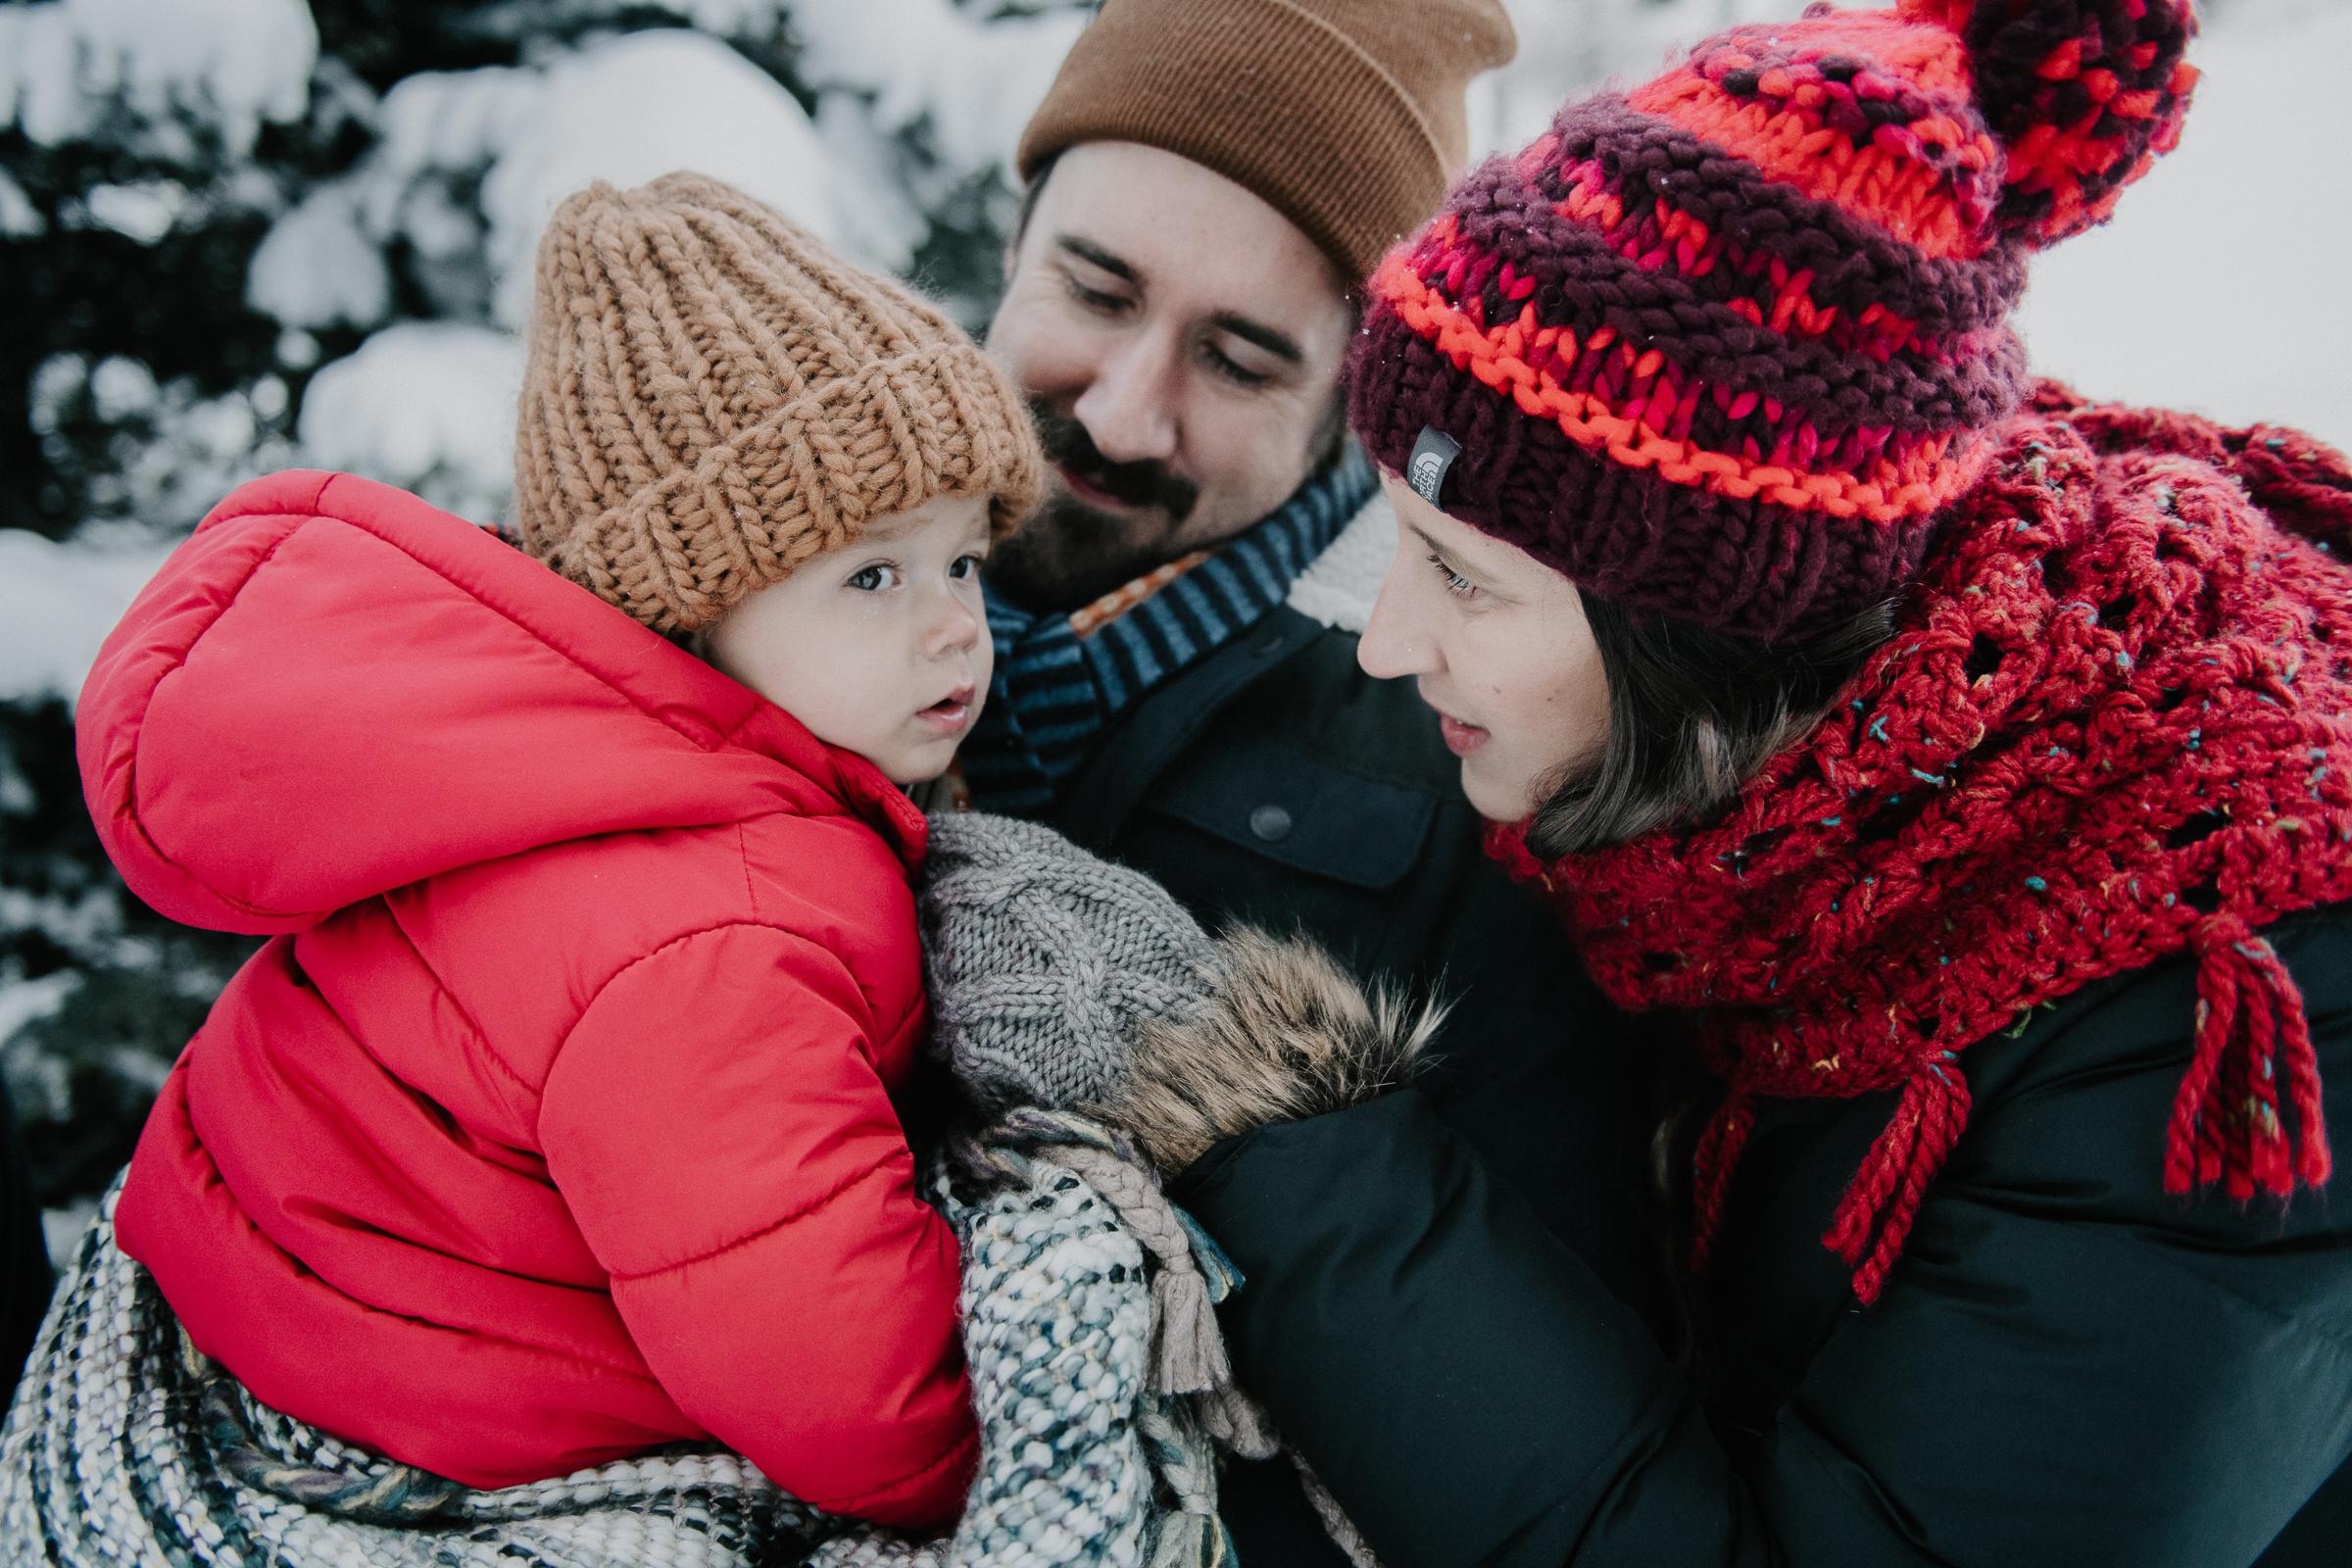 Family photo in snowy mountain